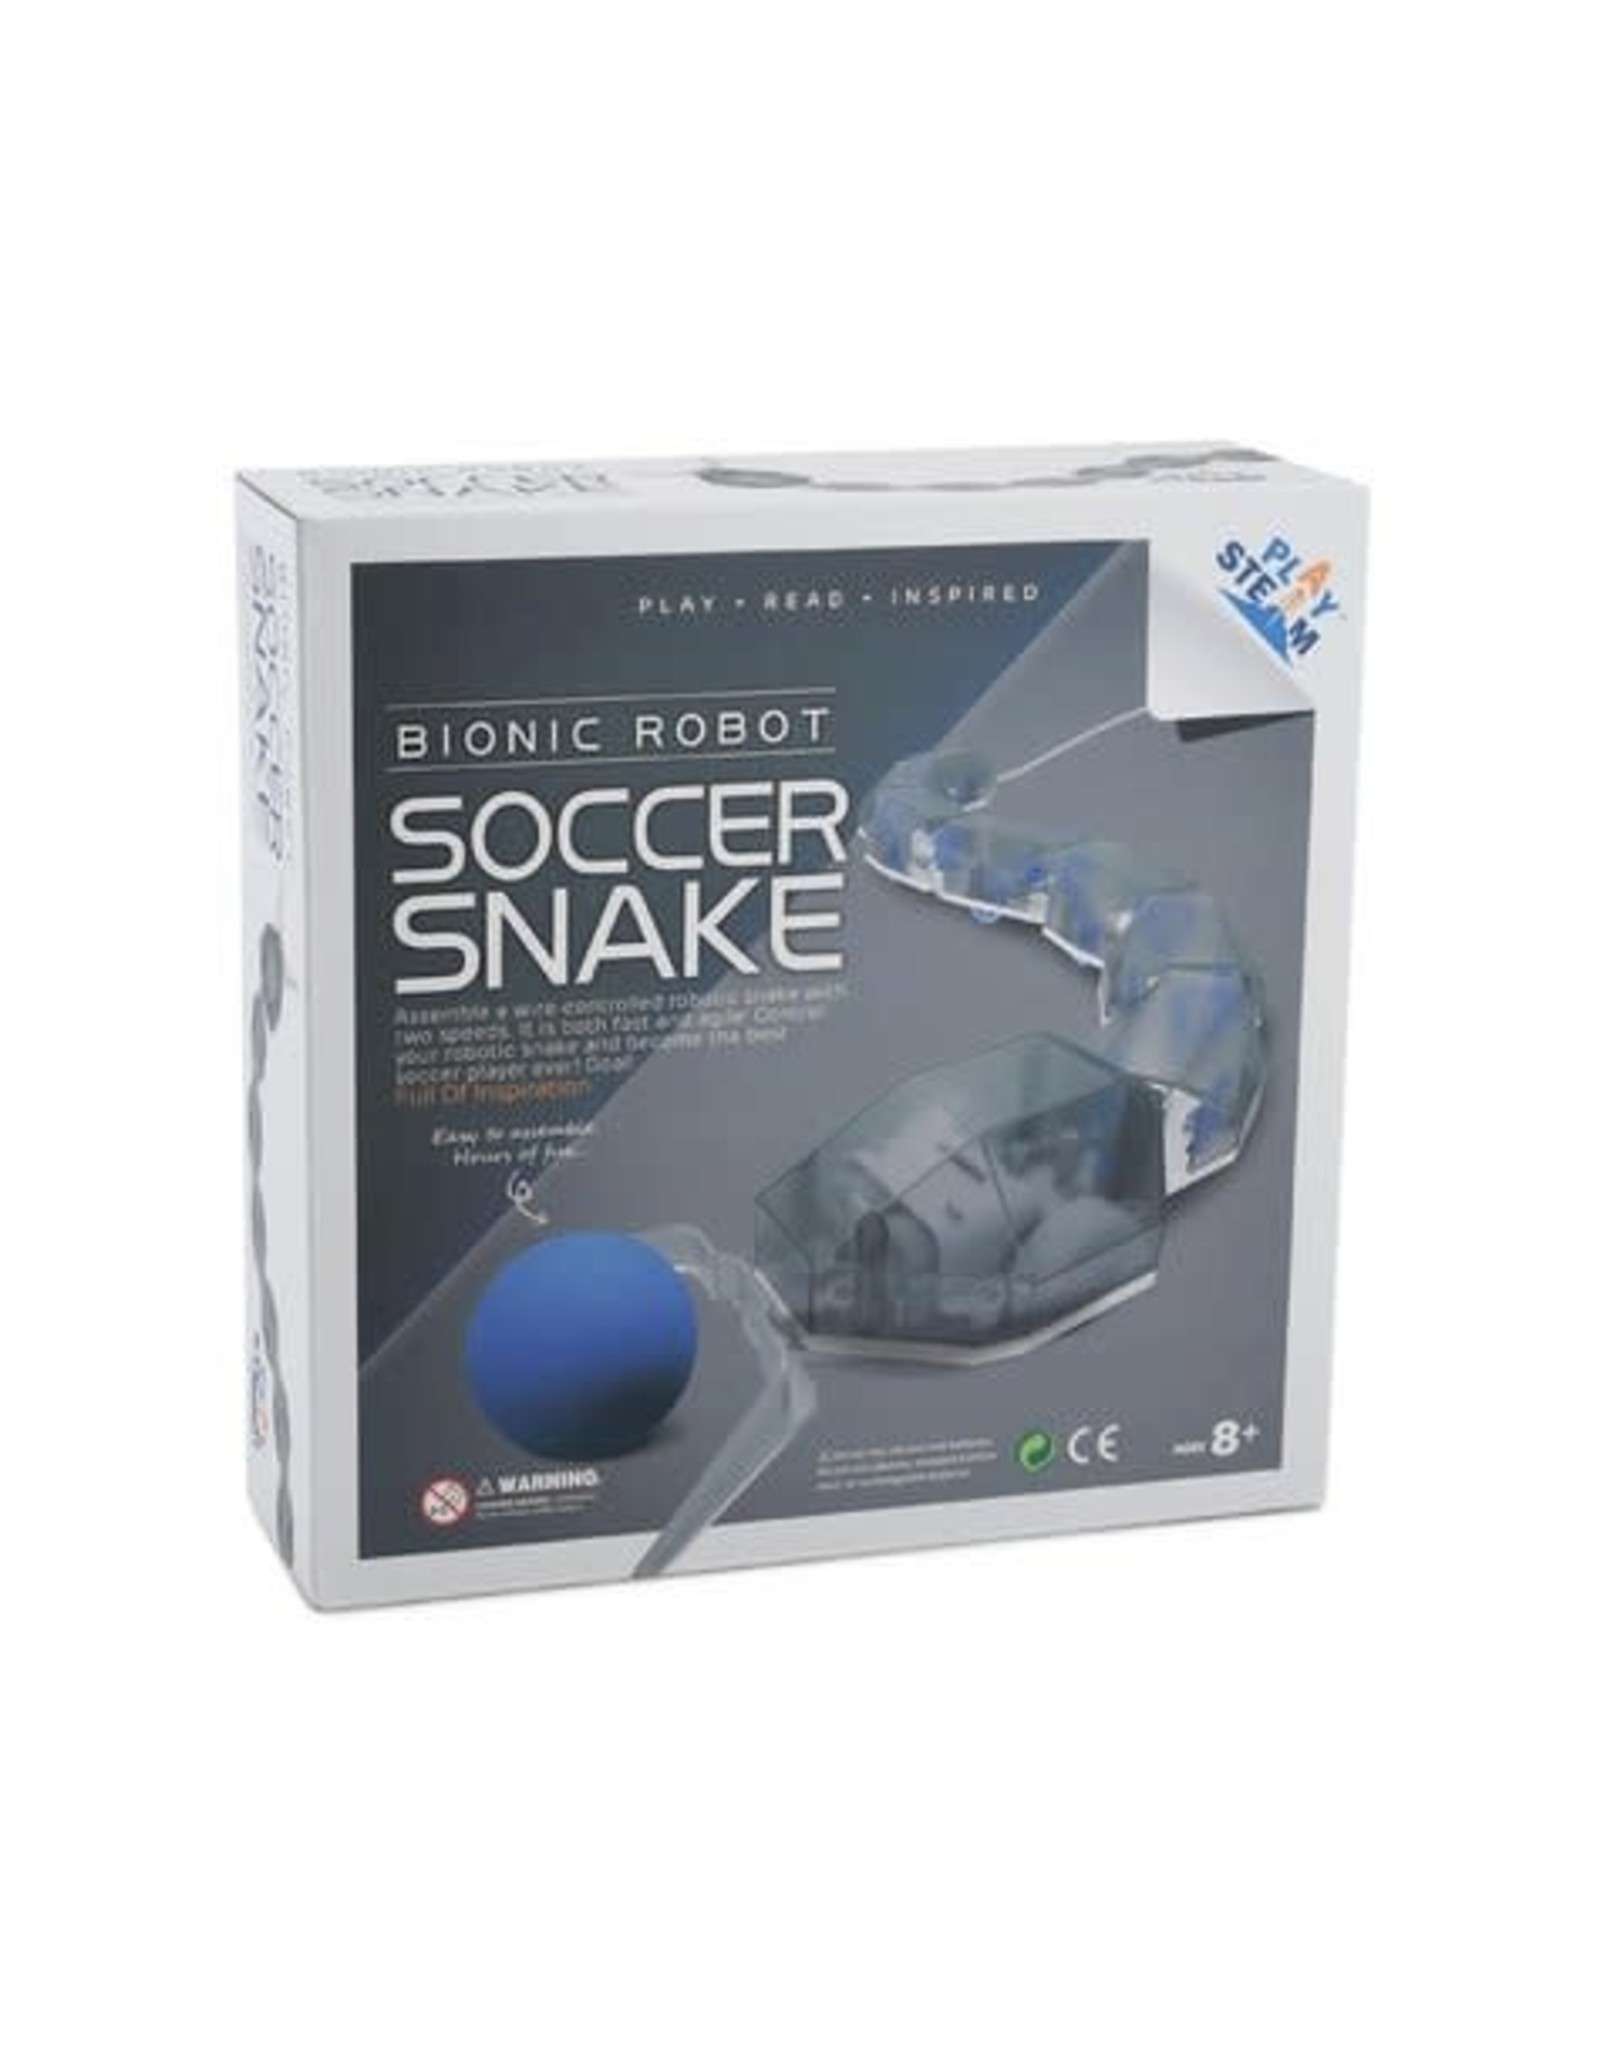 PlaySteam Bionic Robot Soccer Snake